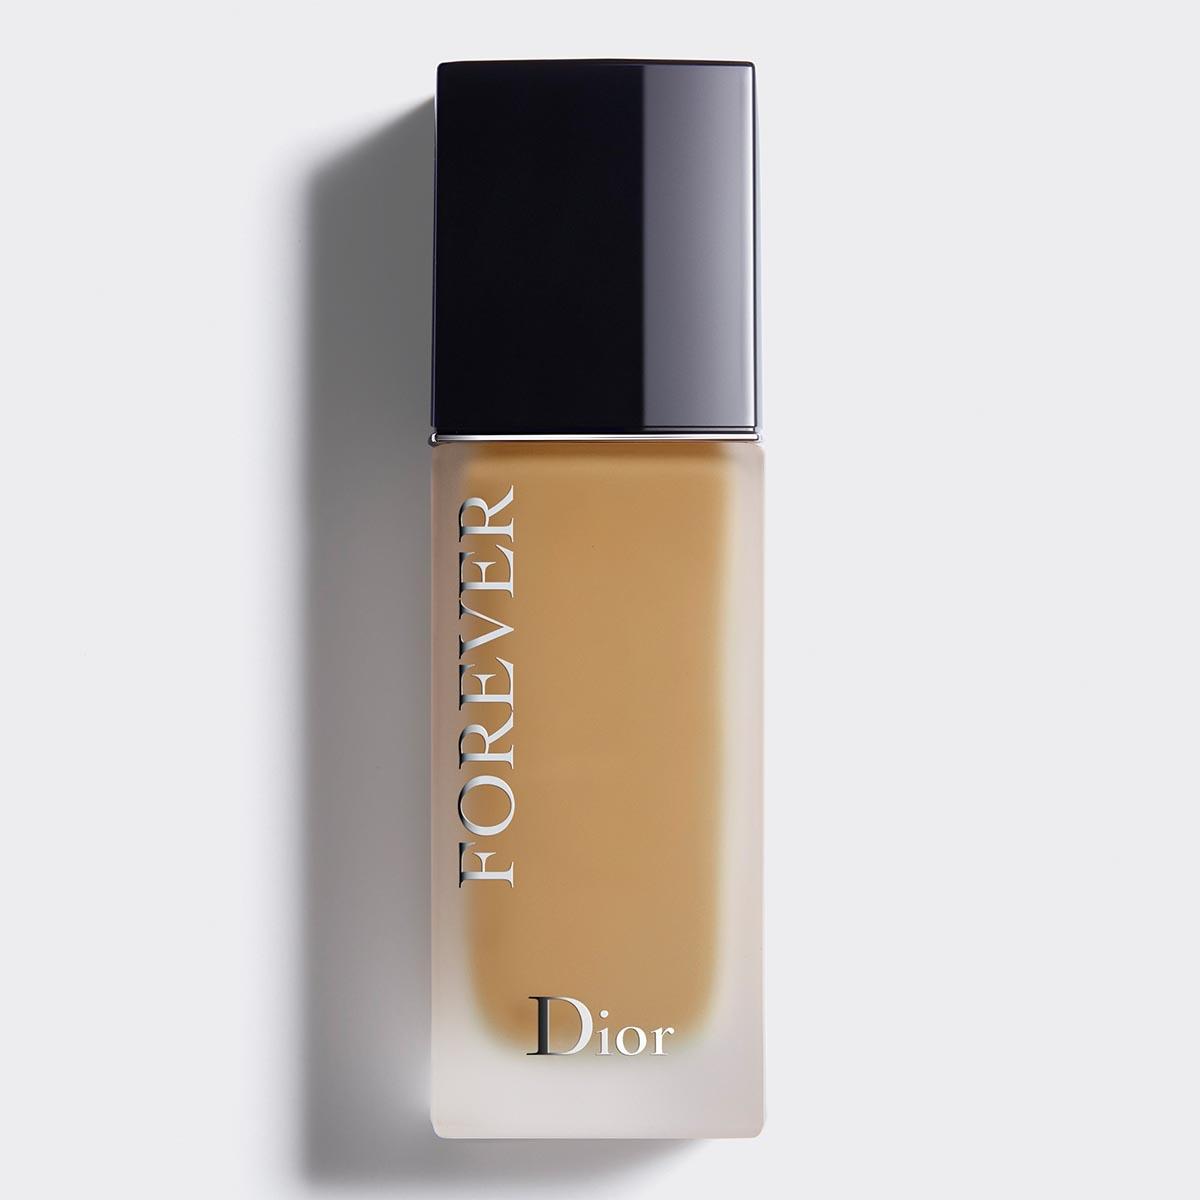 Dior diorskin forever matte base 4w0 warm olive